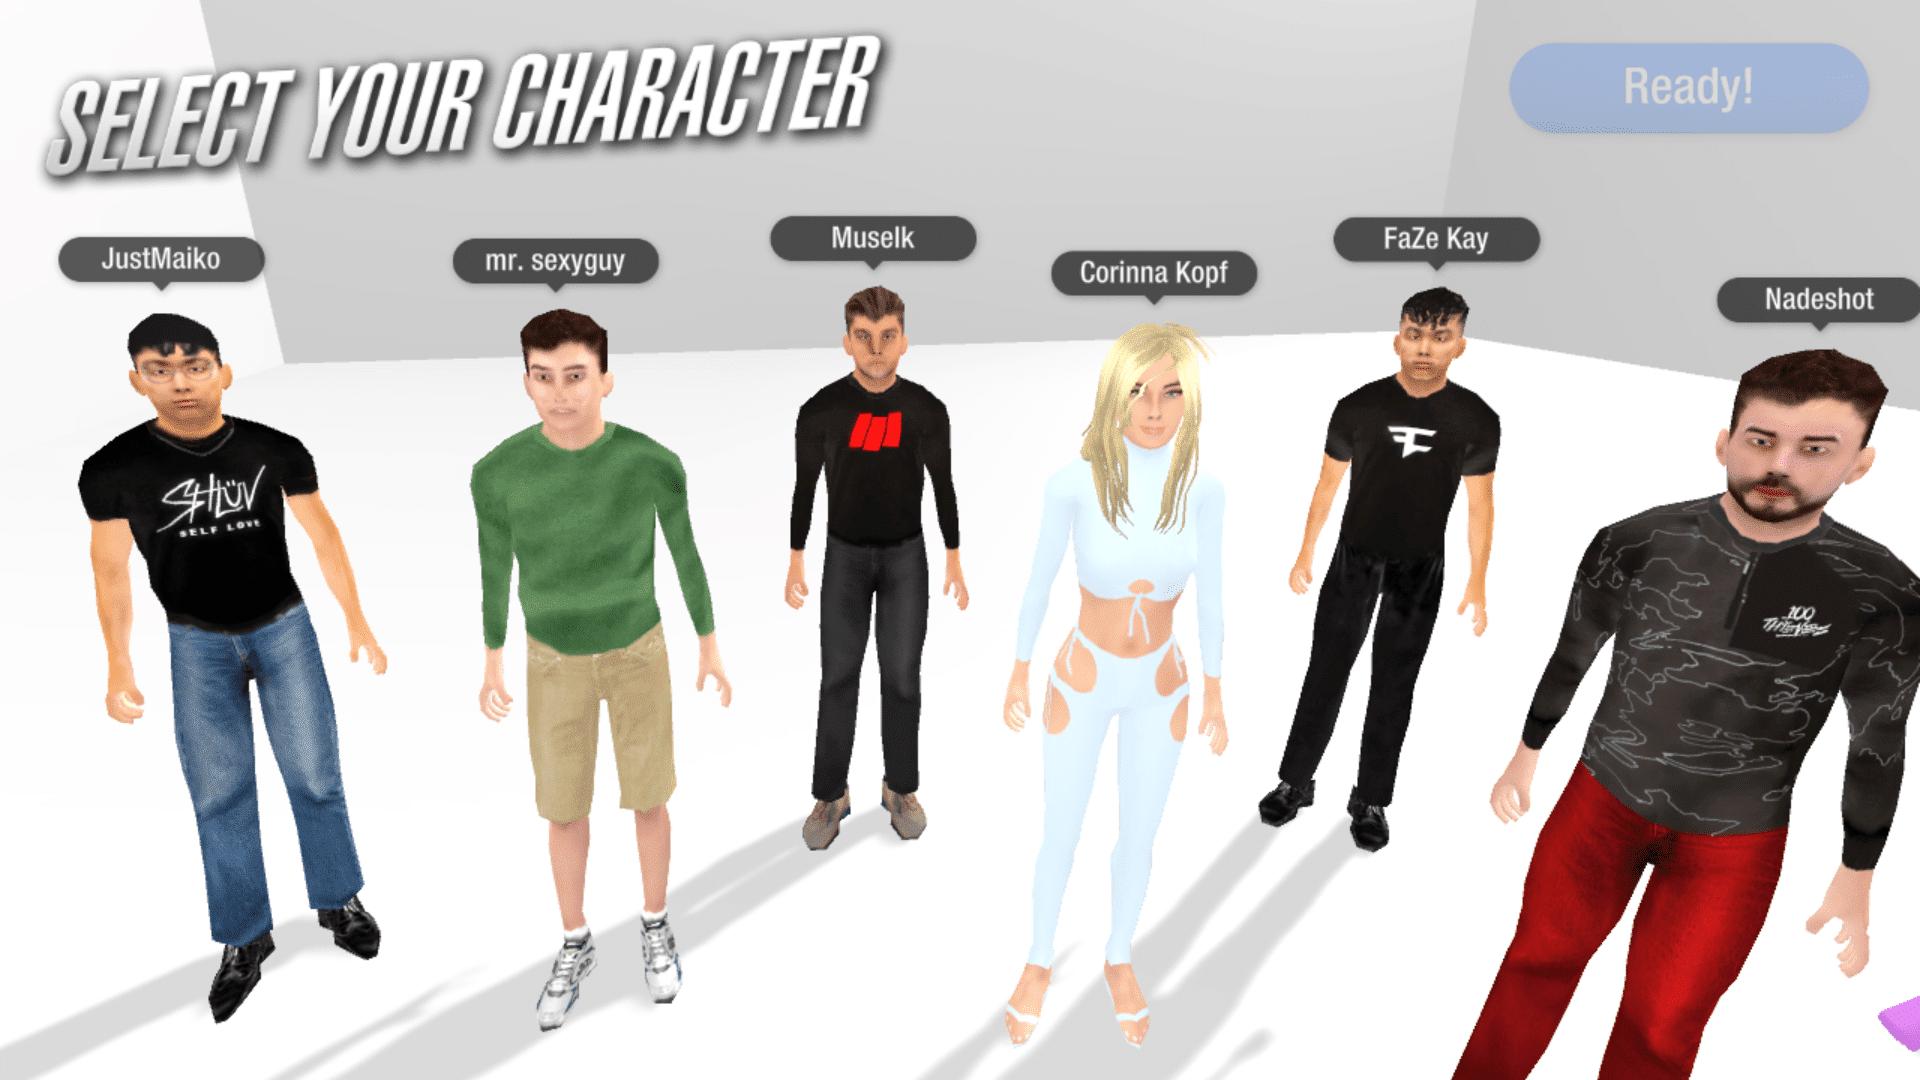 Chair Simulator - Characters